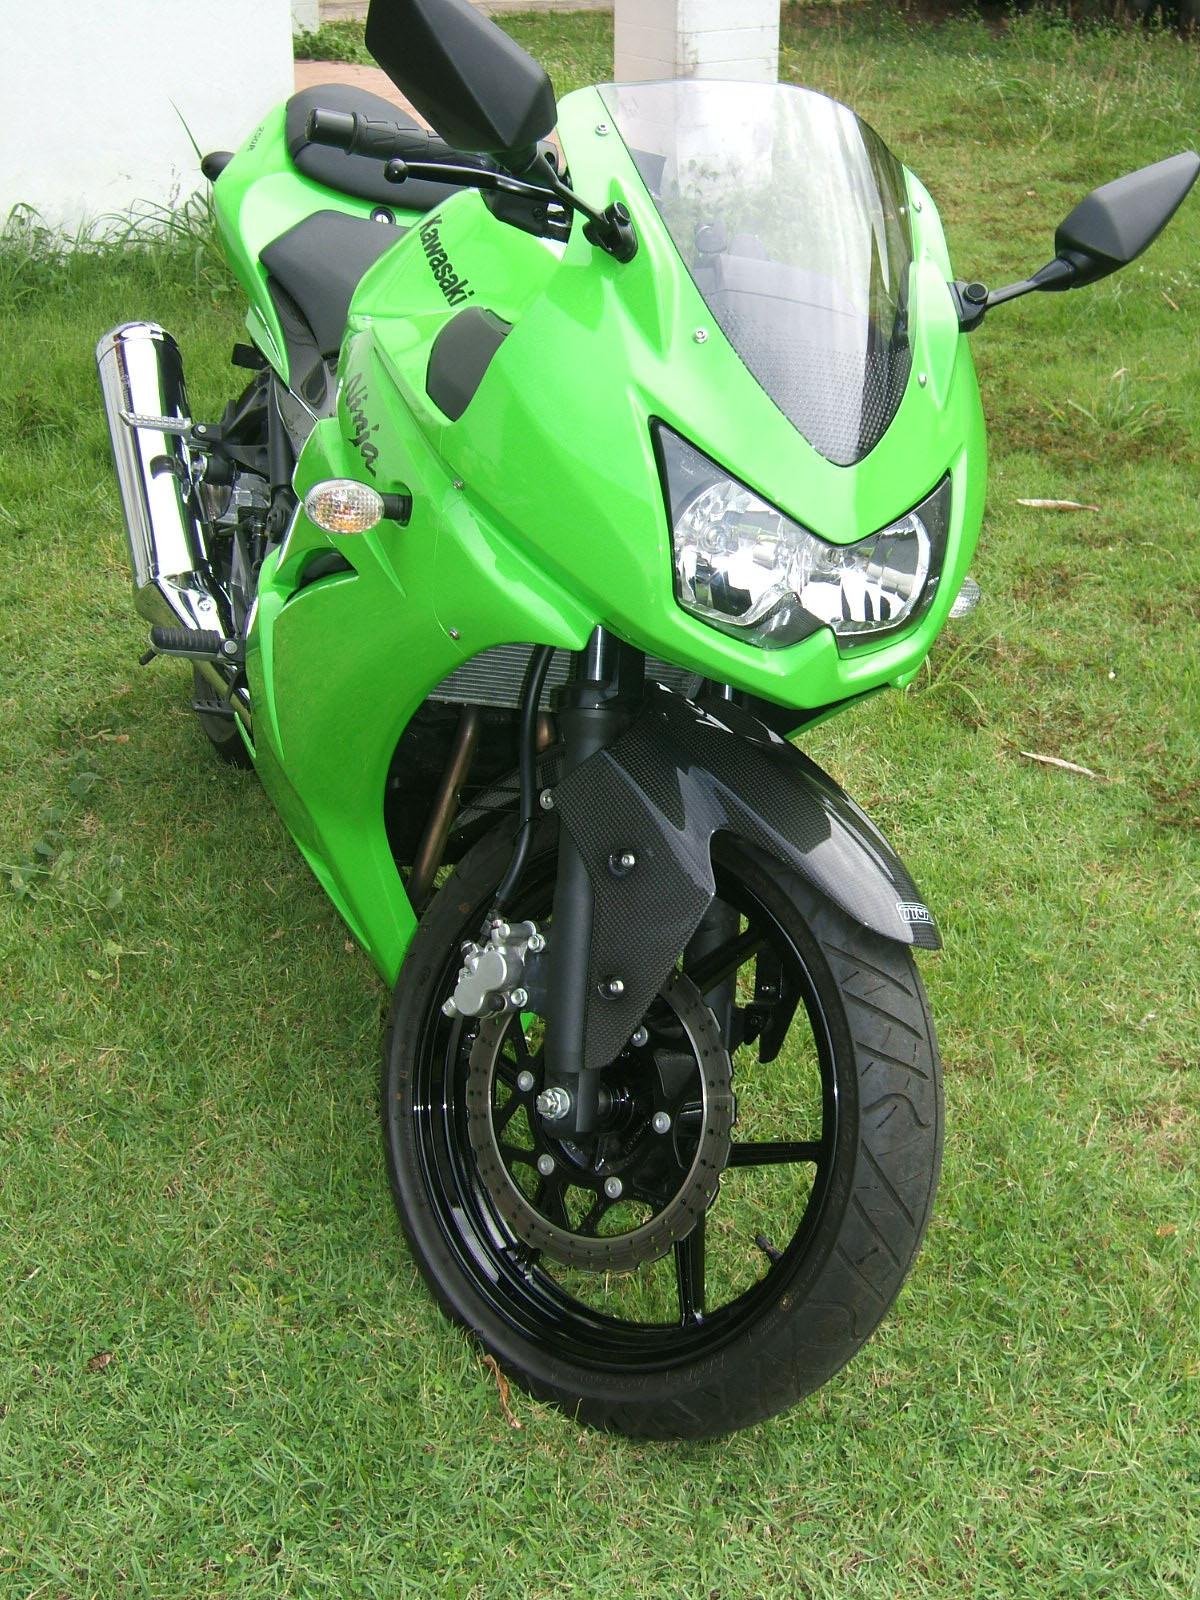 New Front Brake Light Switch Kawasaki Ninja EX 250 R Ninja 2012-2014